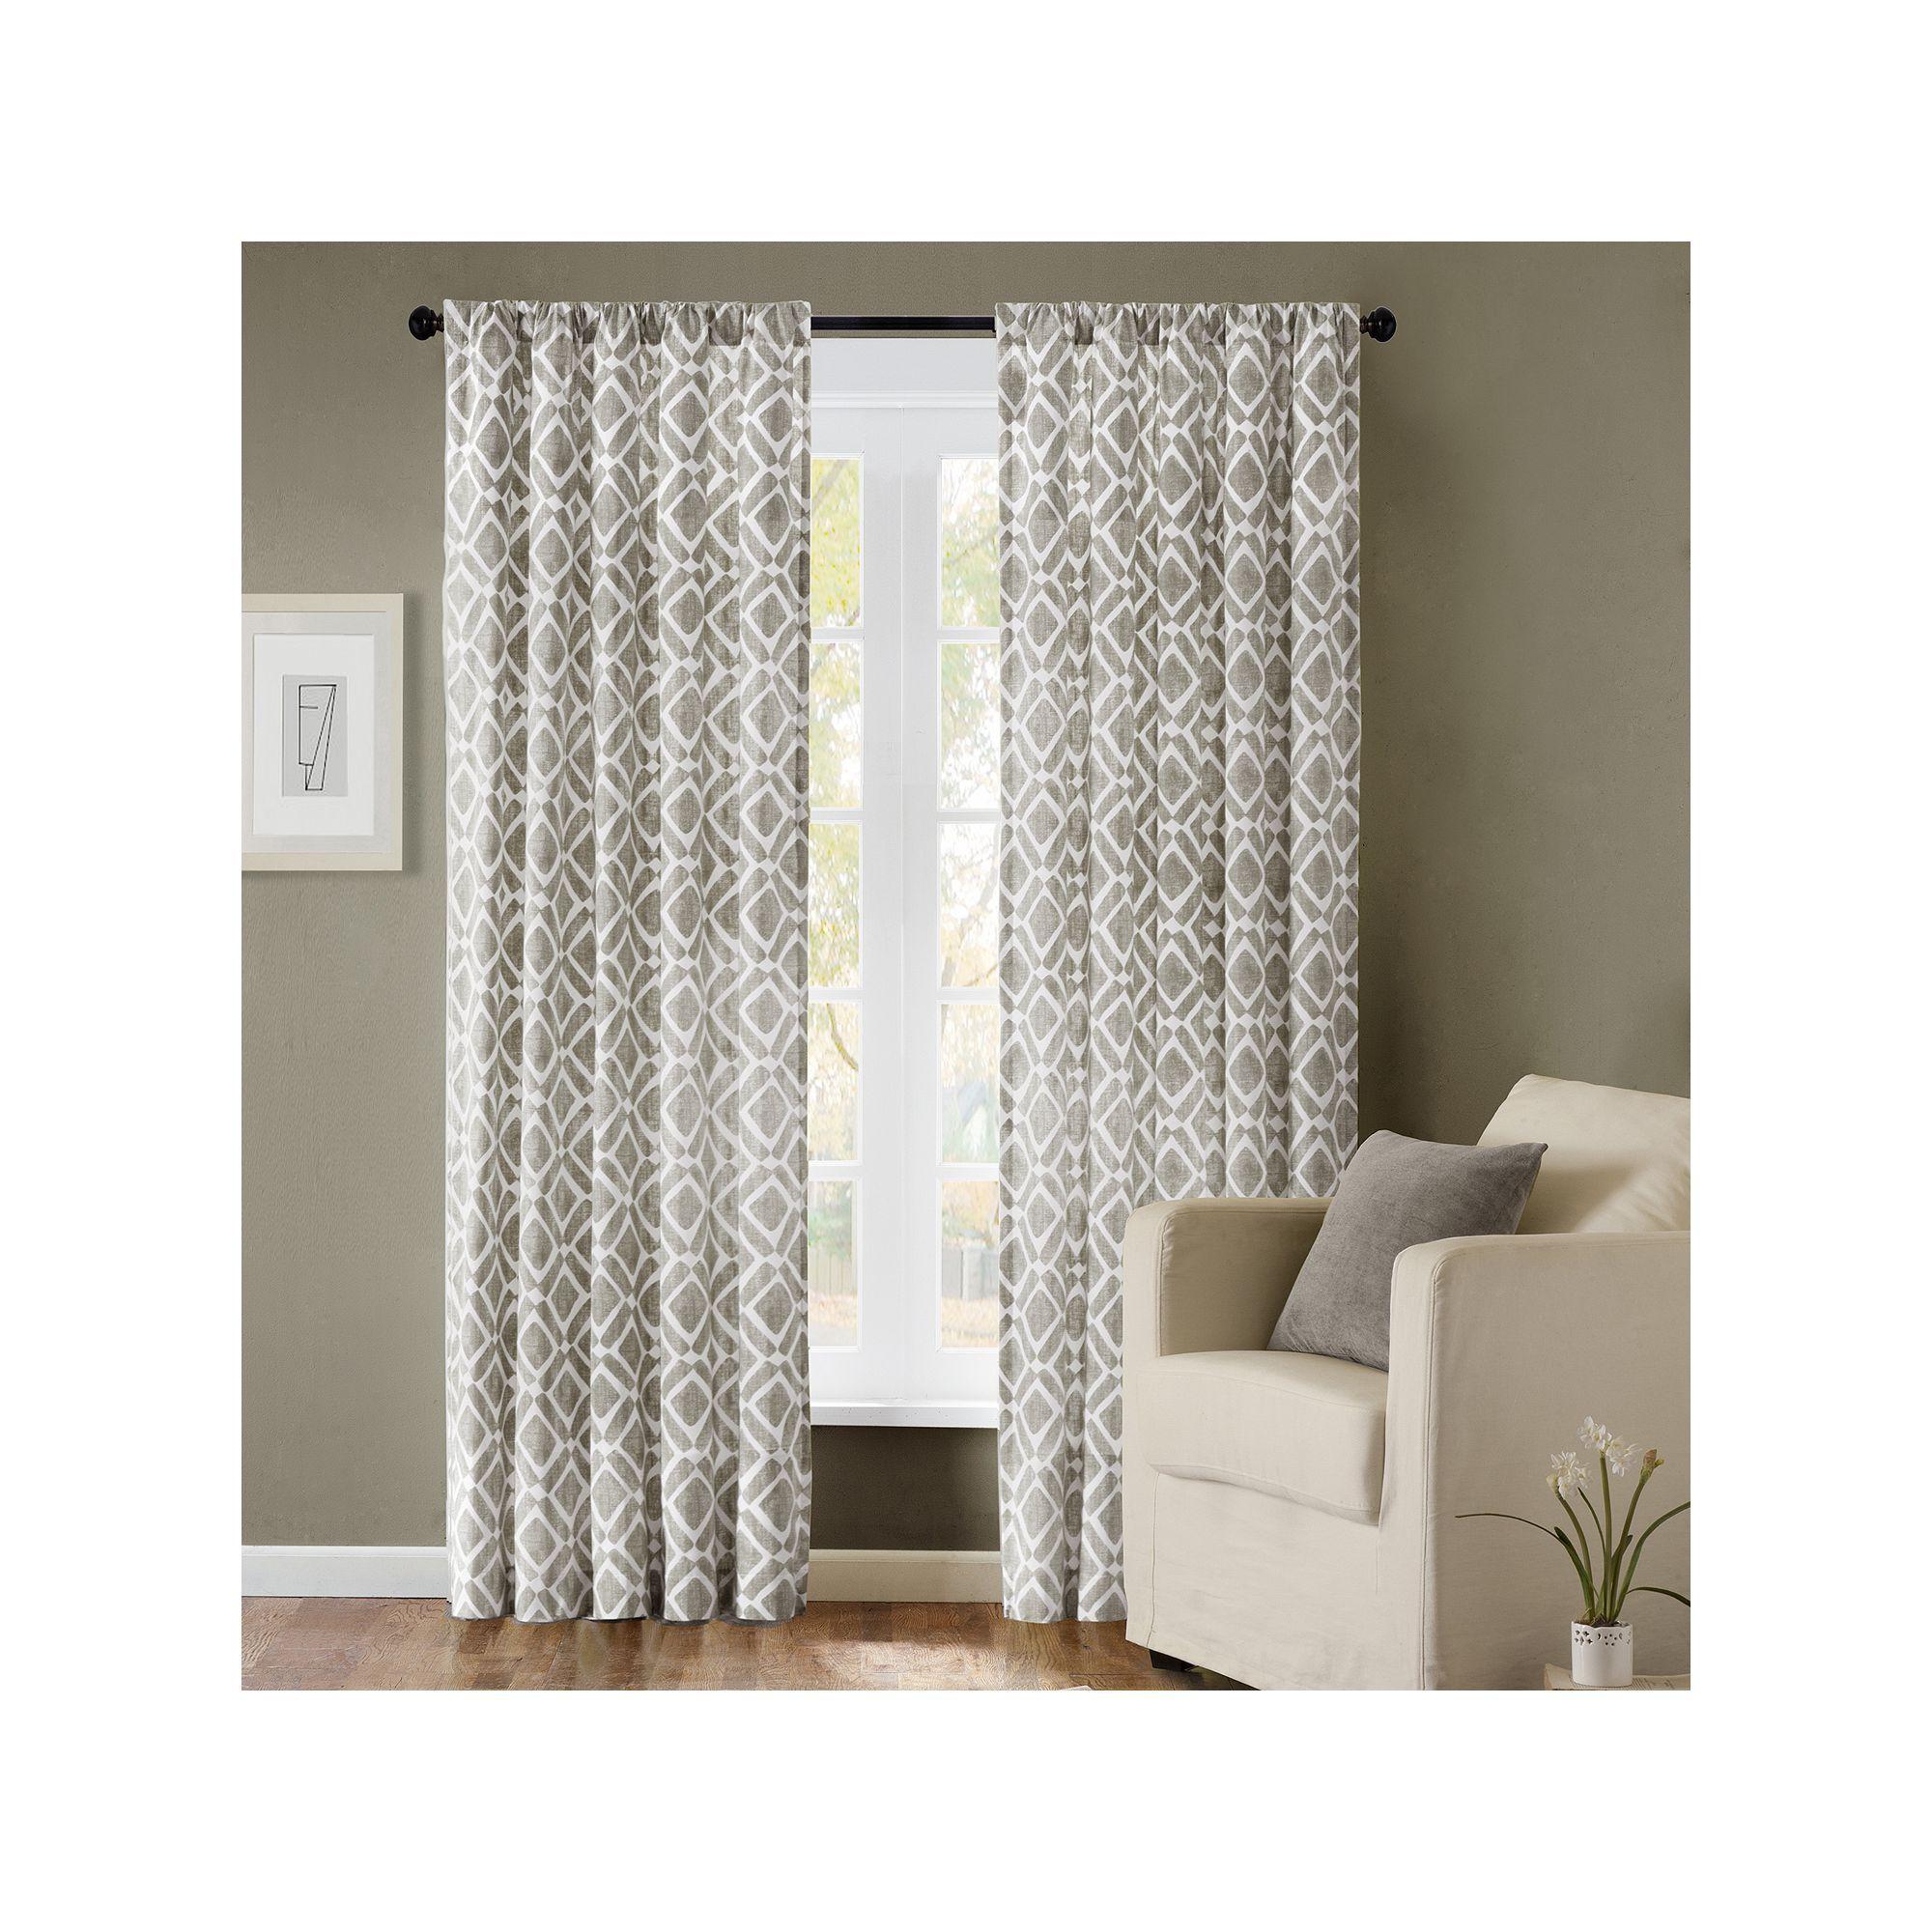 Ella Window Curtain Panels Regarding Well Liked Madison Park 1 Panel Ella Window Curtain, Grey, 42X95 (Gallery 3 of 20)